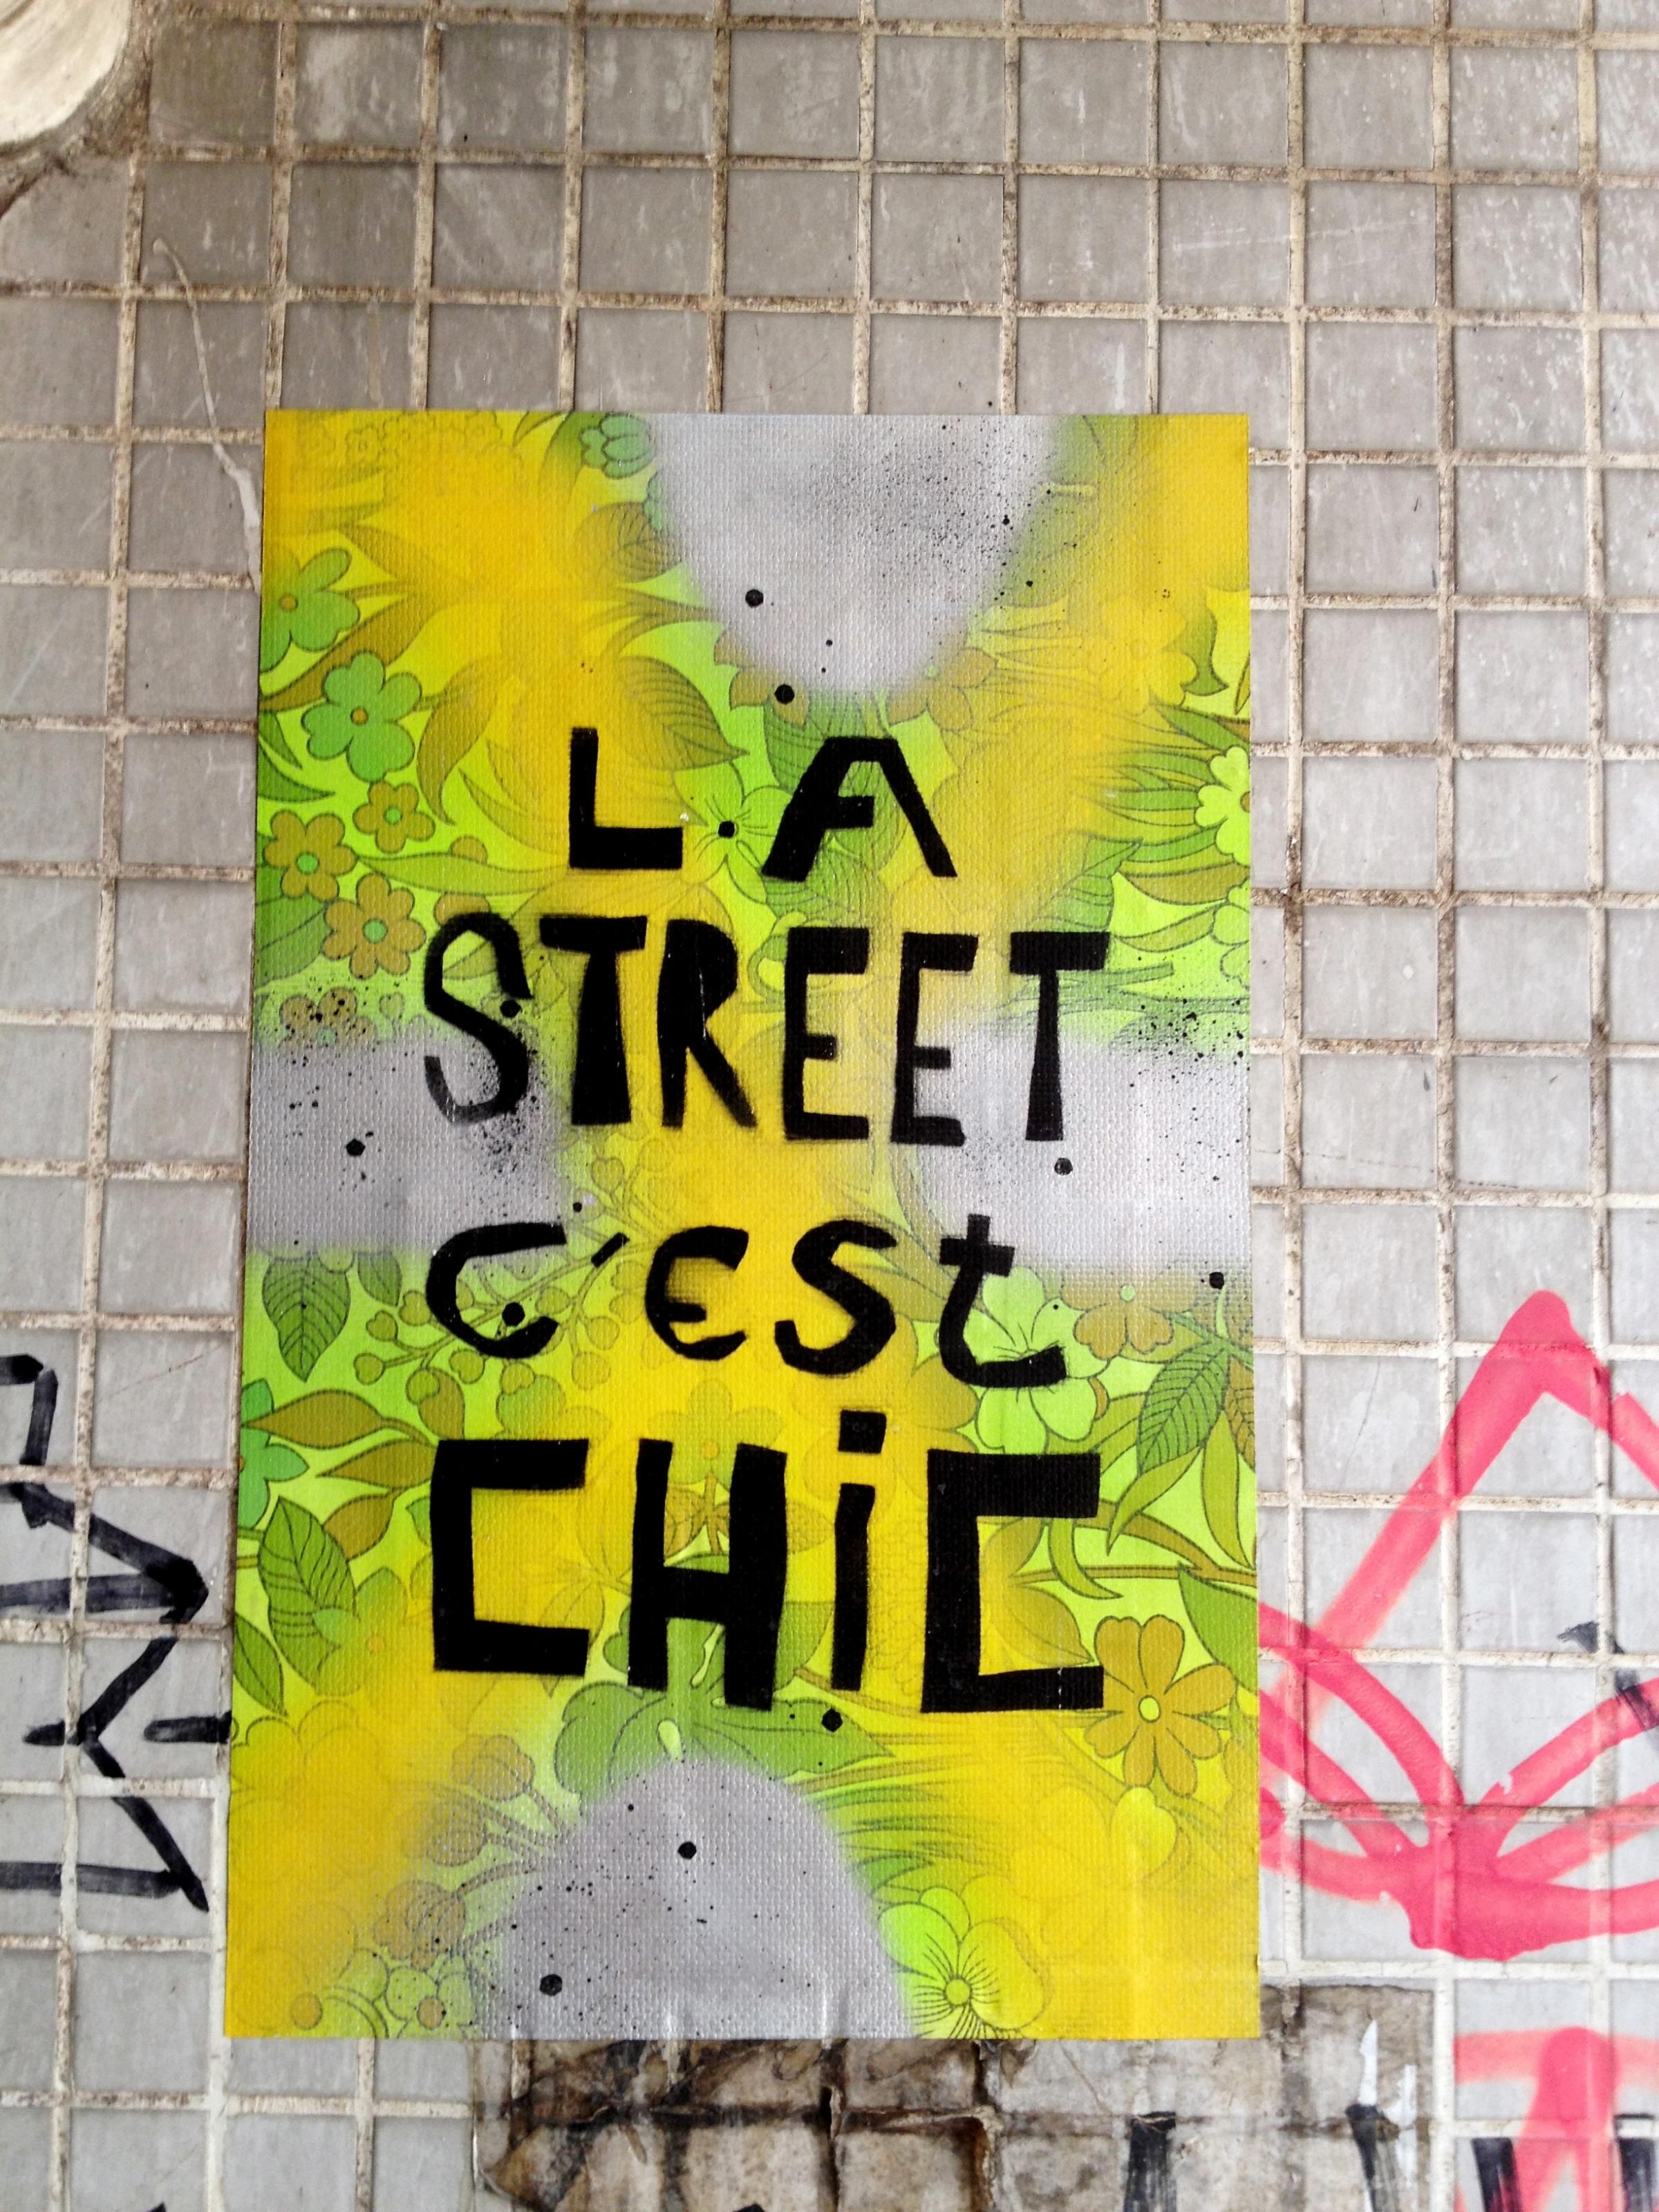 La Street C'est Chic